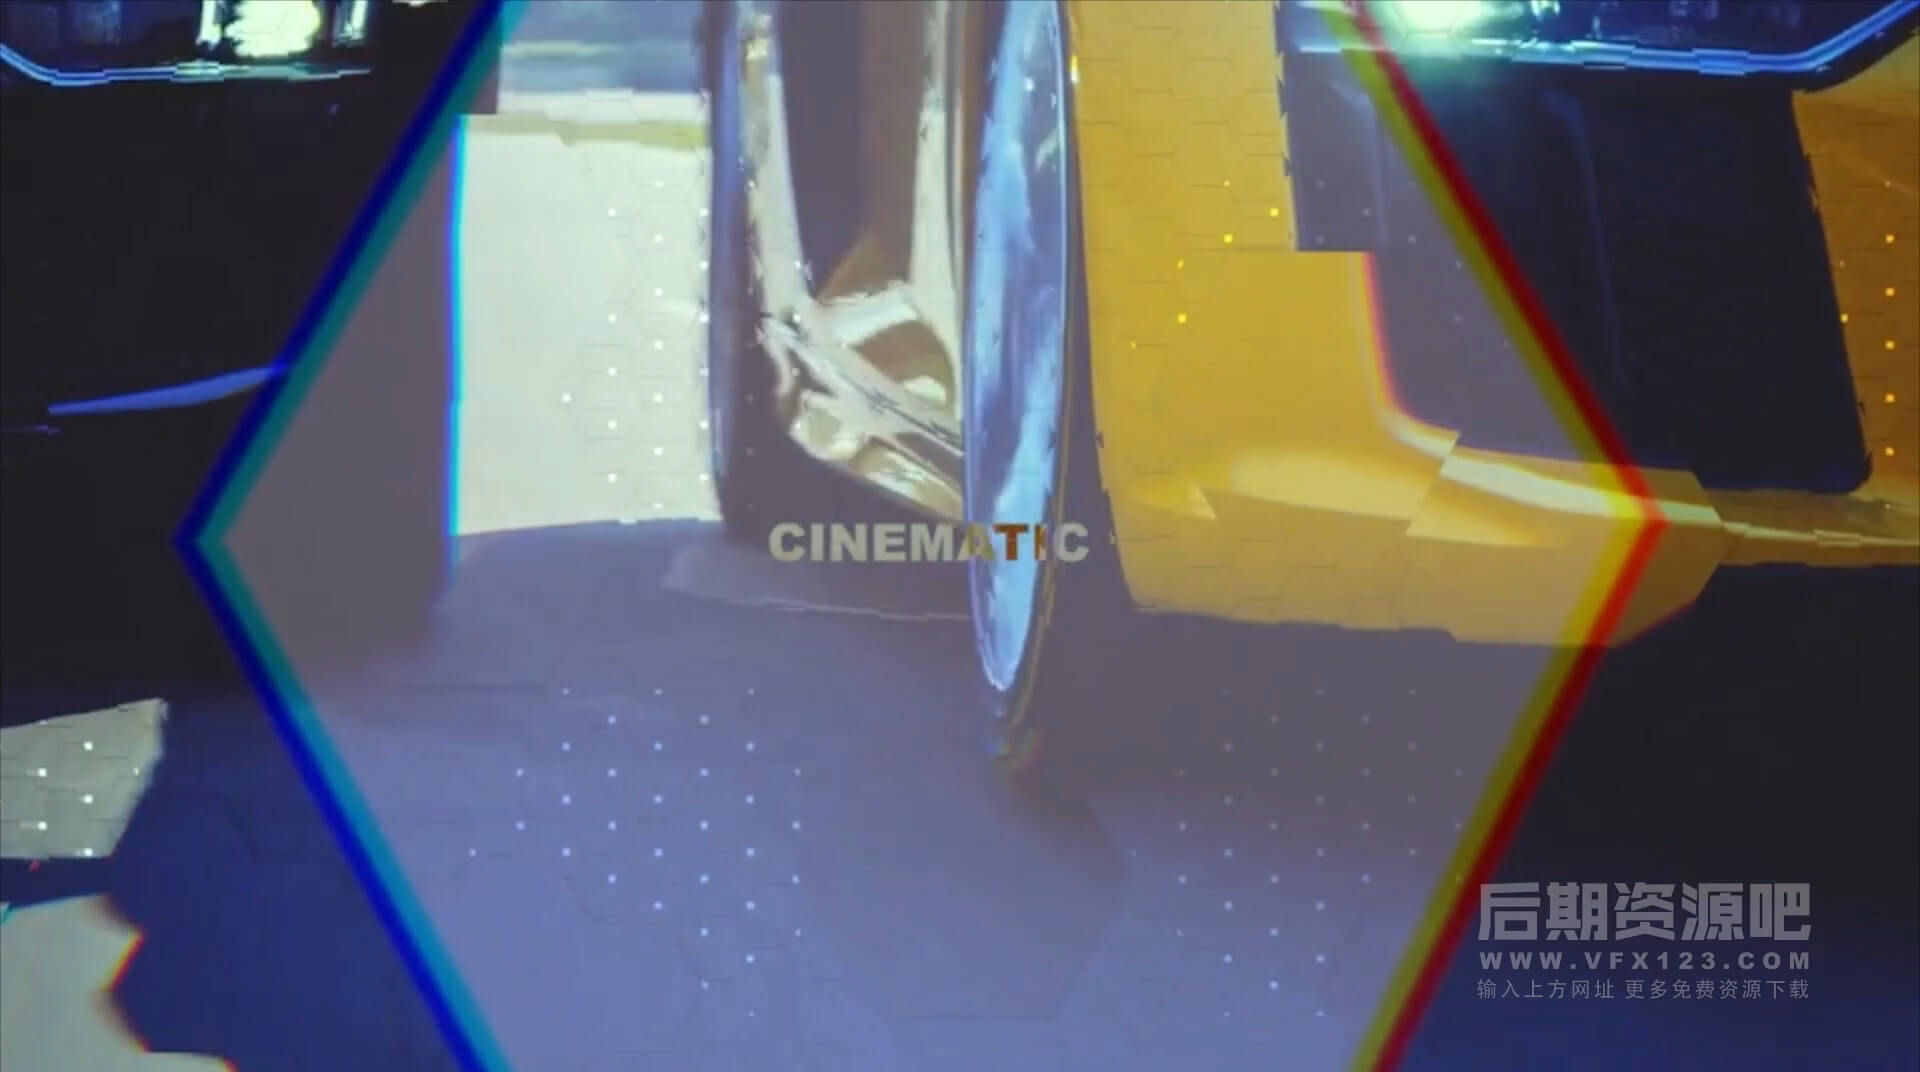 Motion模板 毛刺干扰特效科幻风格电影预告片头插件 Hexagon Glitch Opener